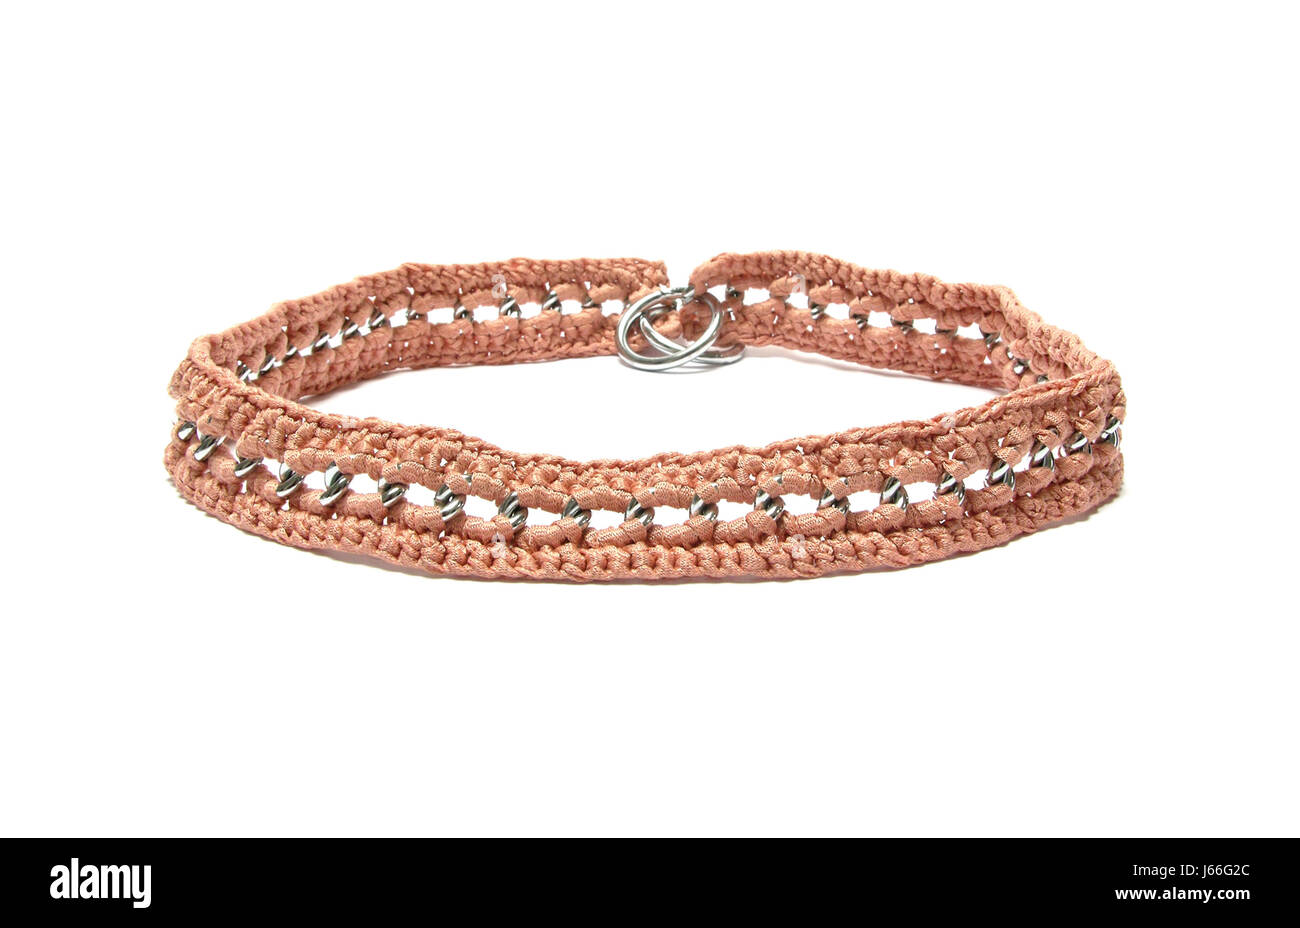 Chain Dog Necklace Crochet Dog Collar Optional Pet Brown Brownish